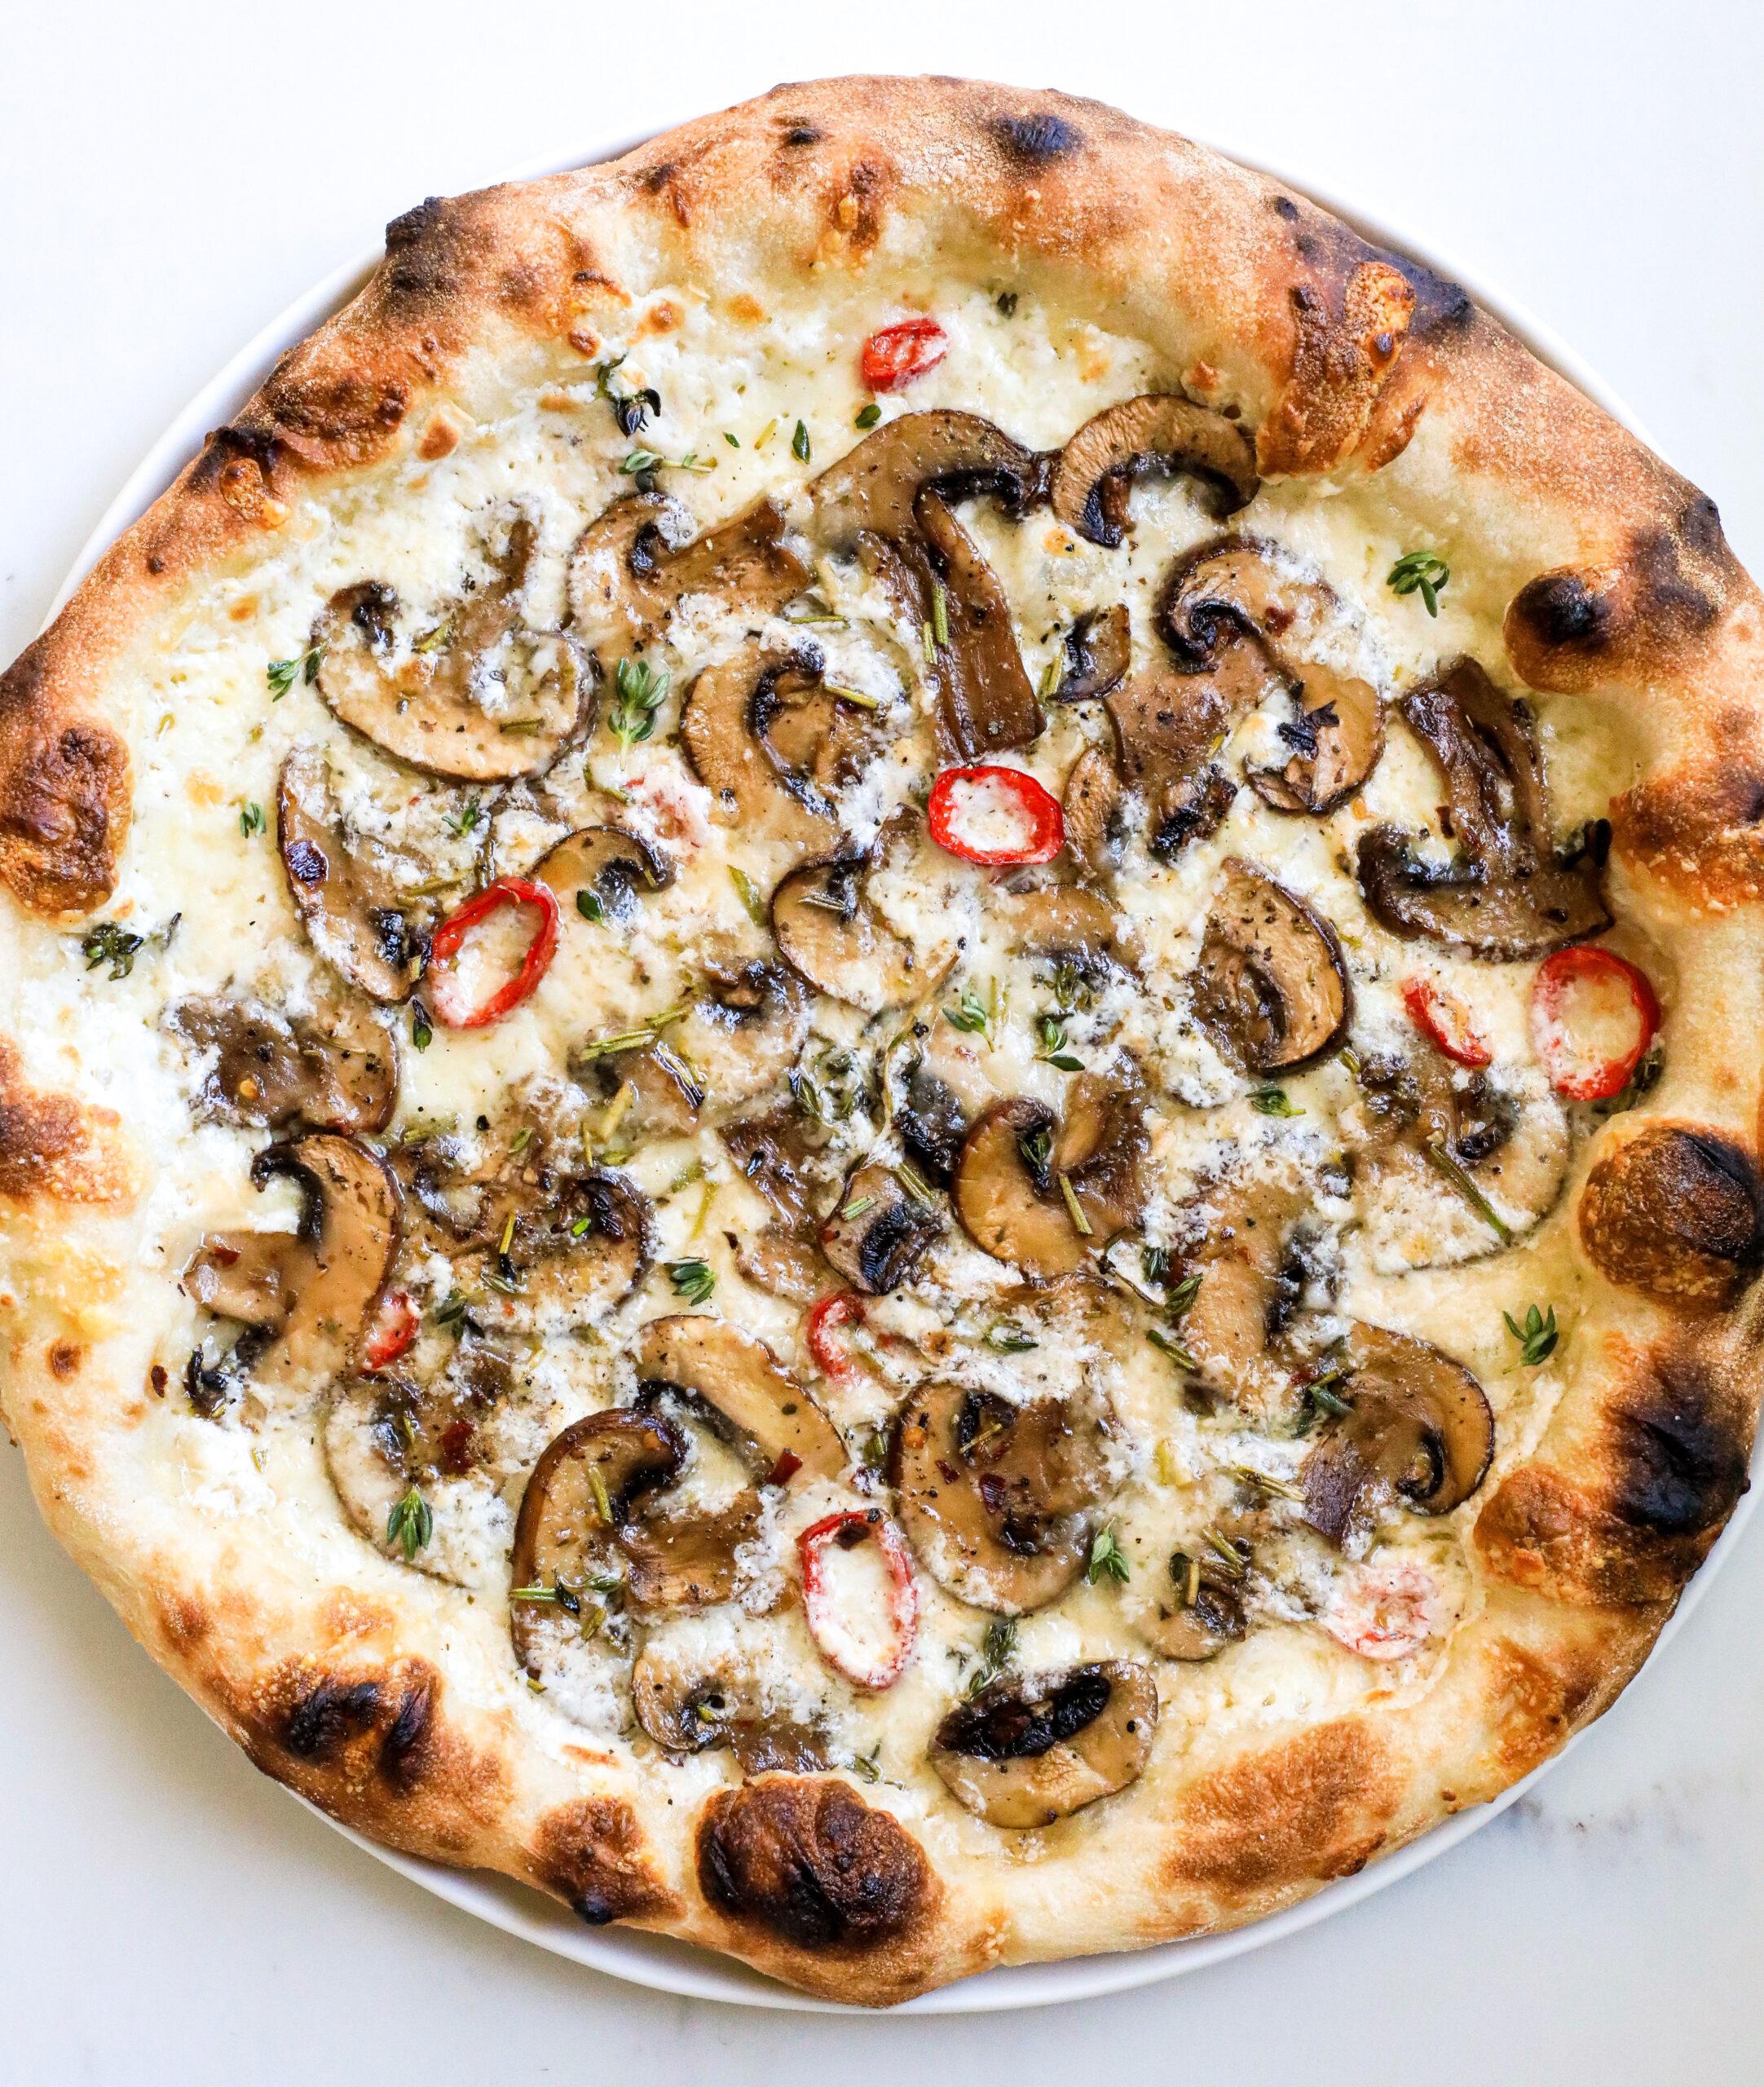 Herby Mushroom Pizza